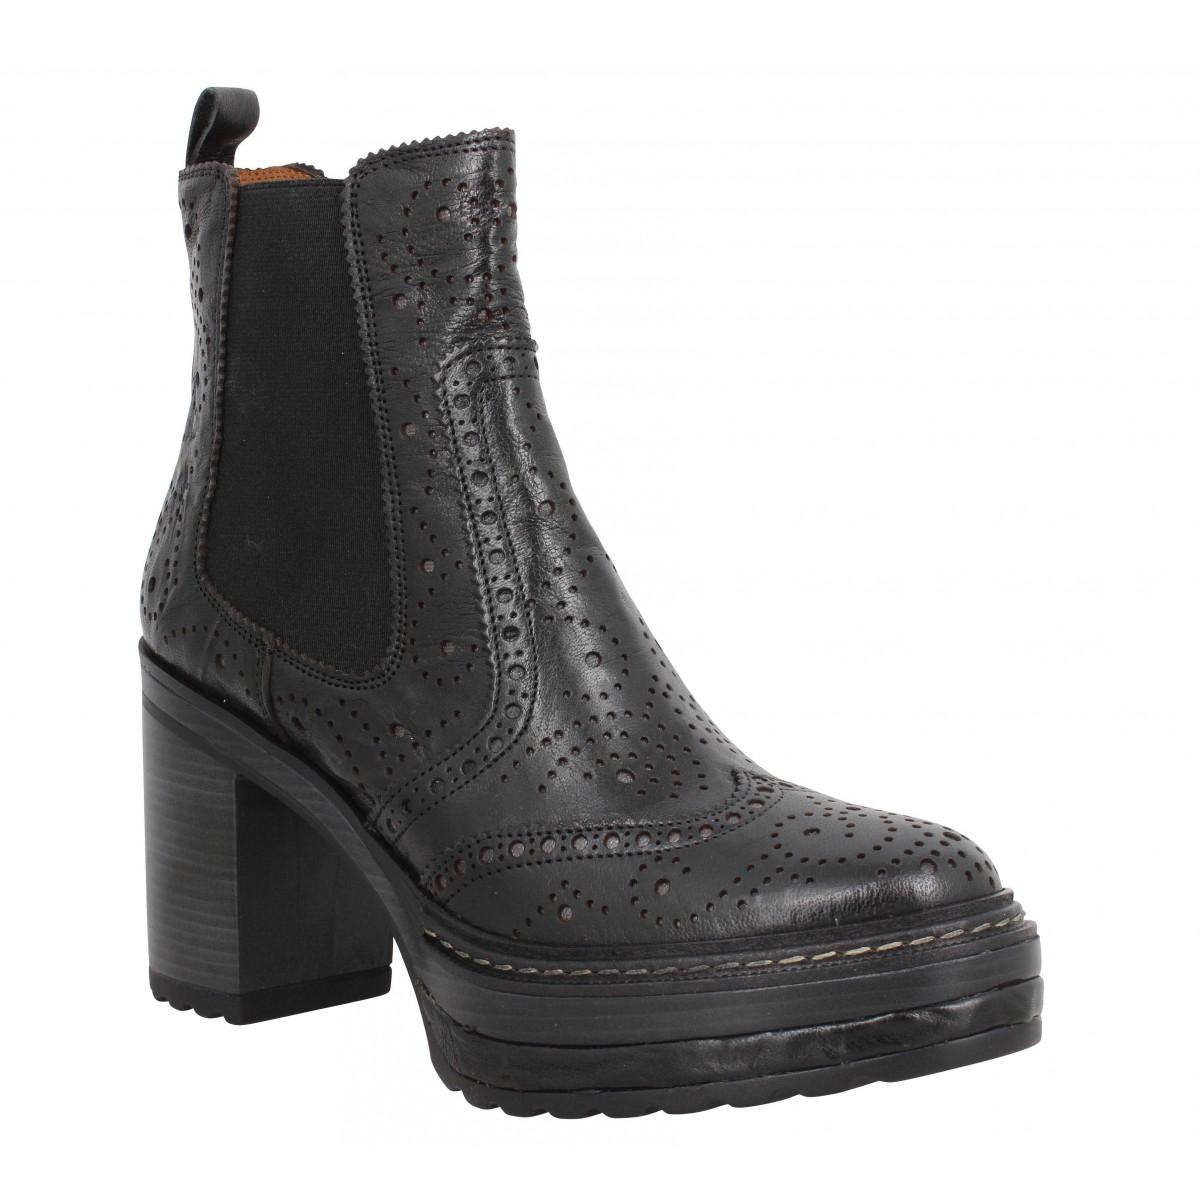 Bottines PONS QUINTANA 8911 cuir Femme Noir